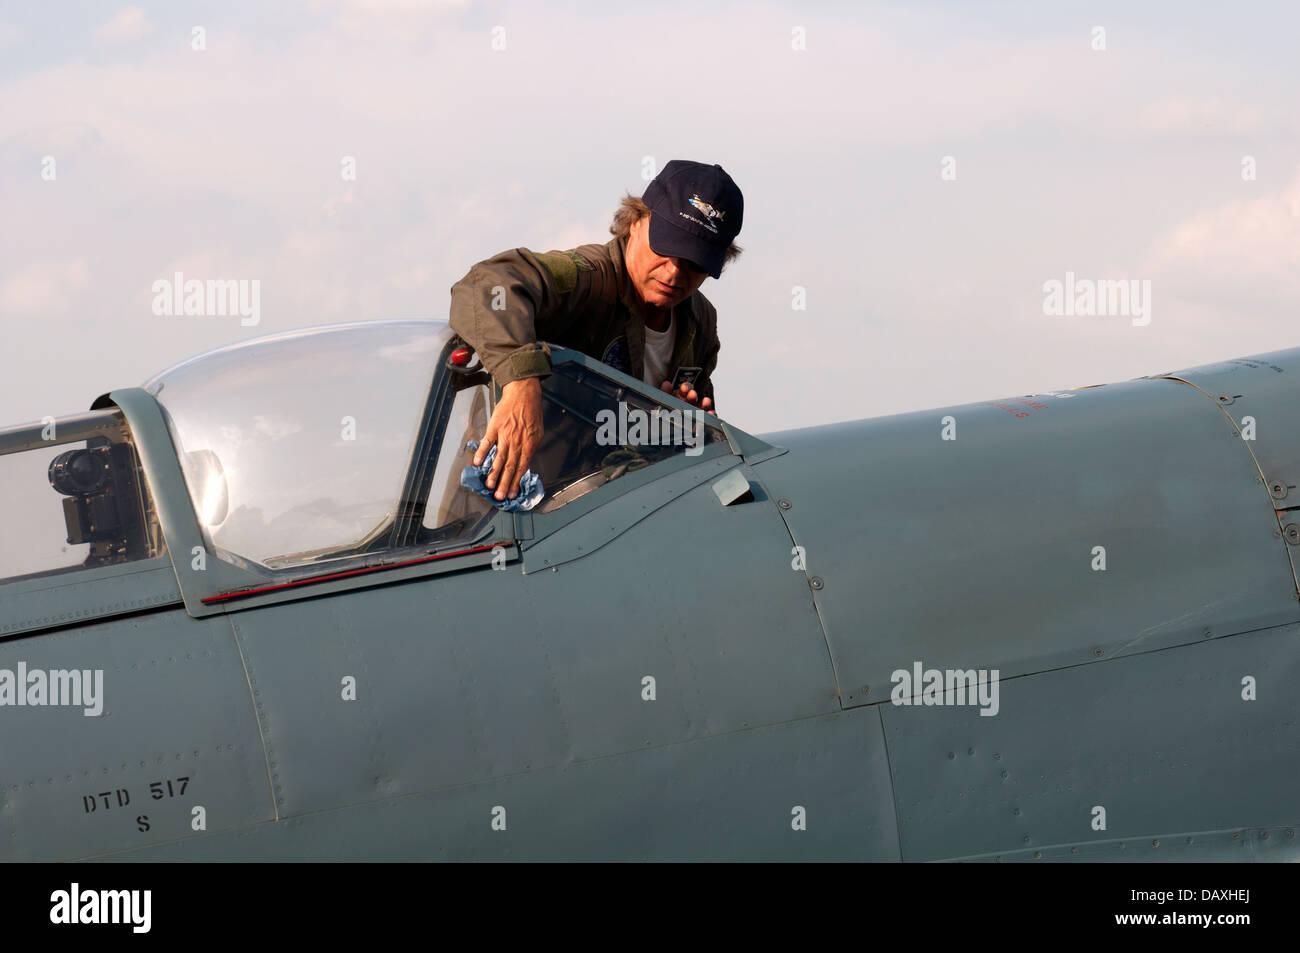 Pilot Peter Teichman with Spitfire Mk XI aircraft - Stock Image